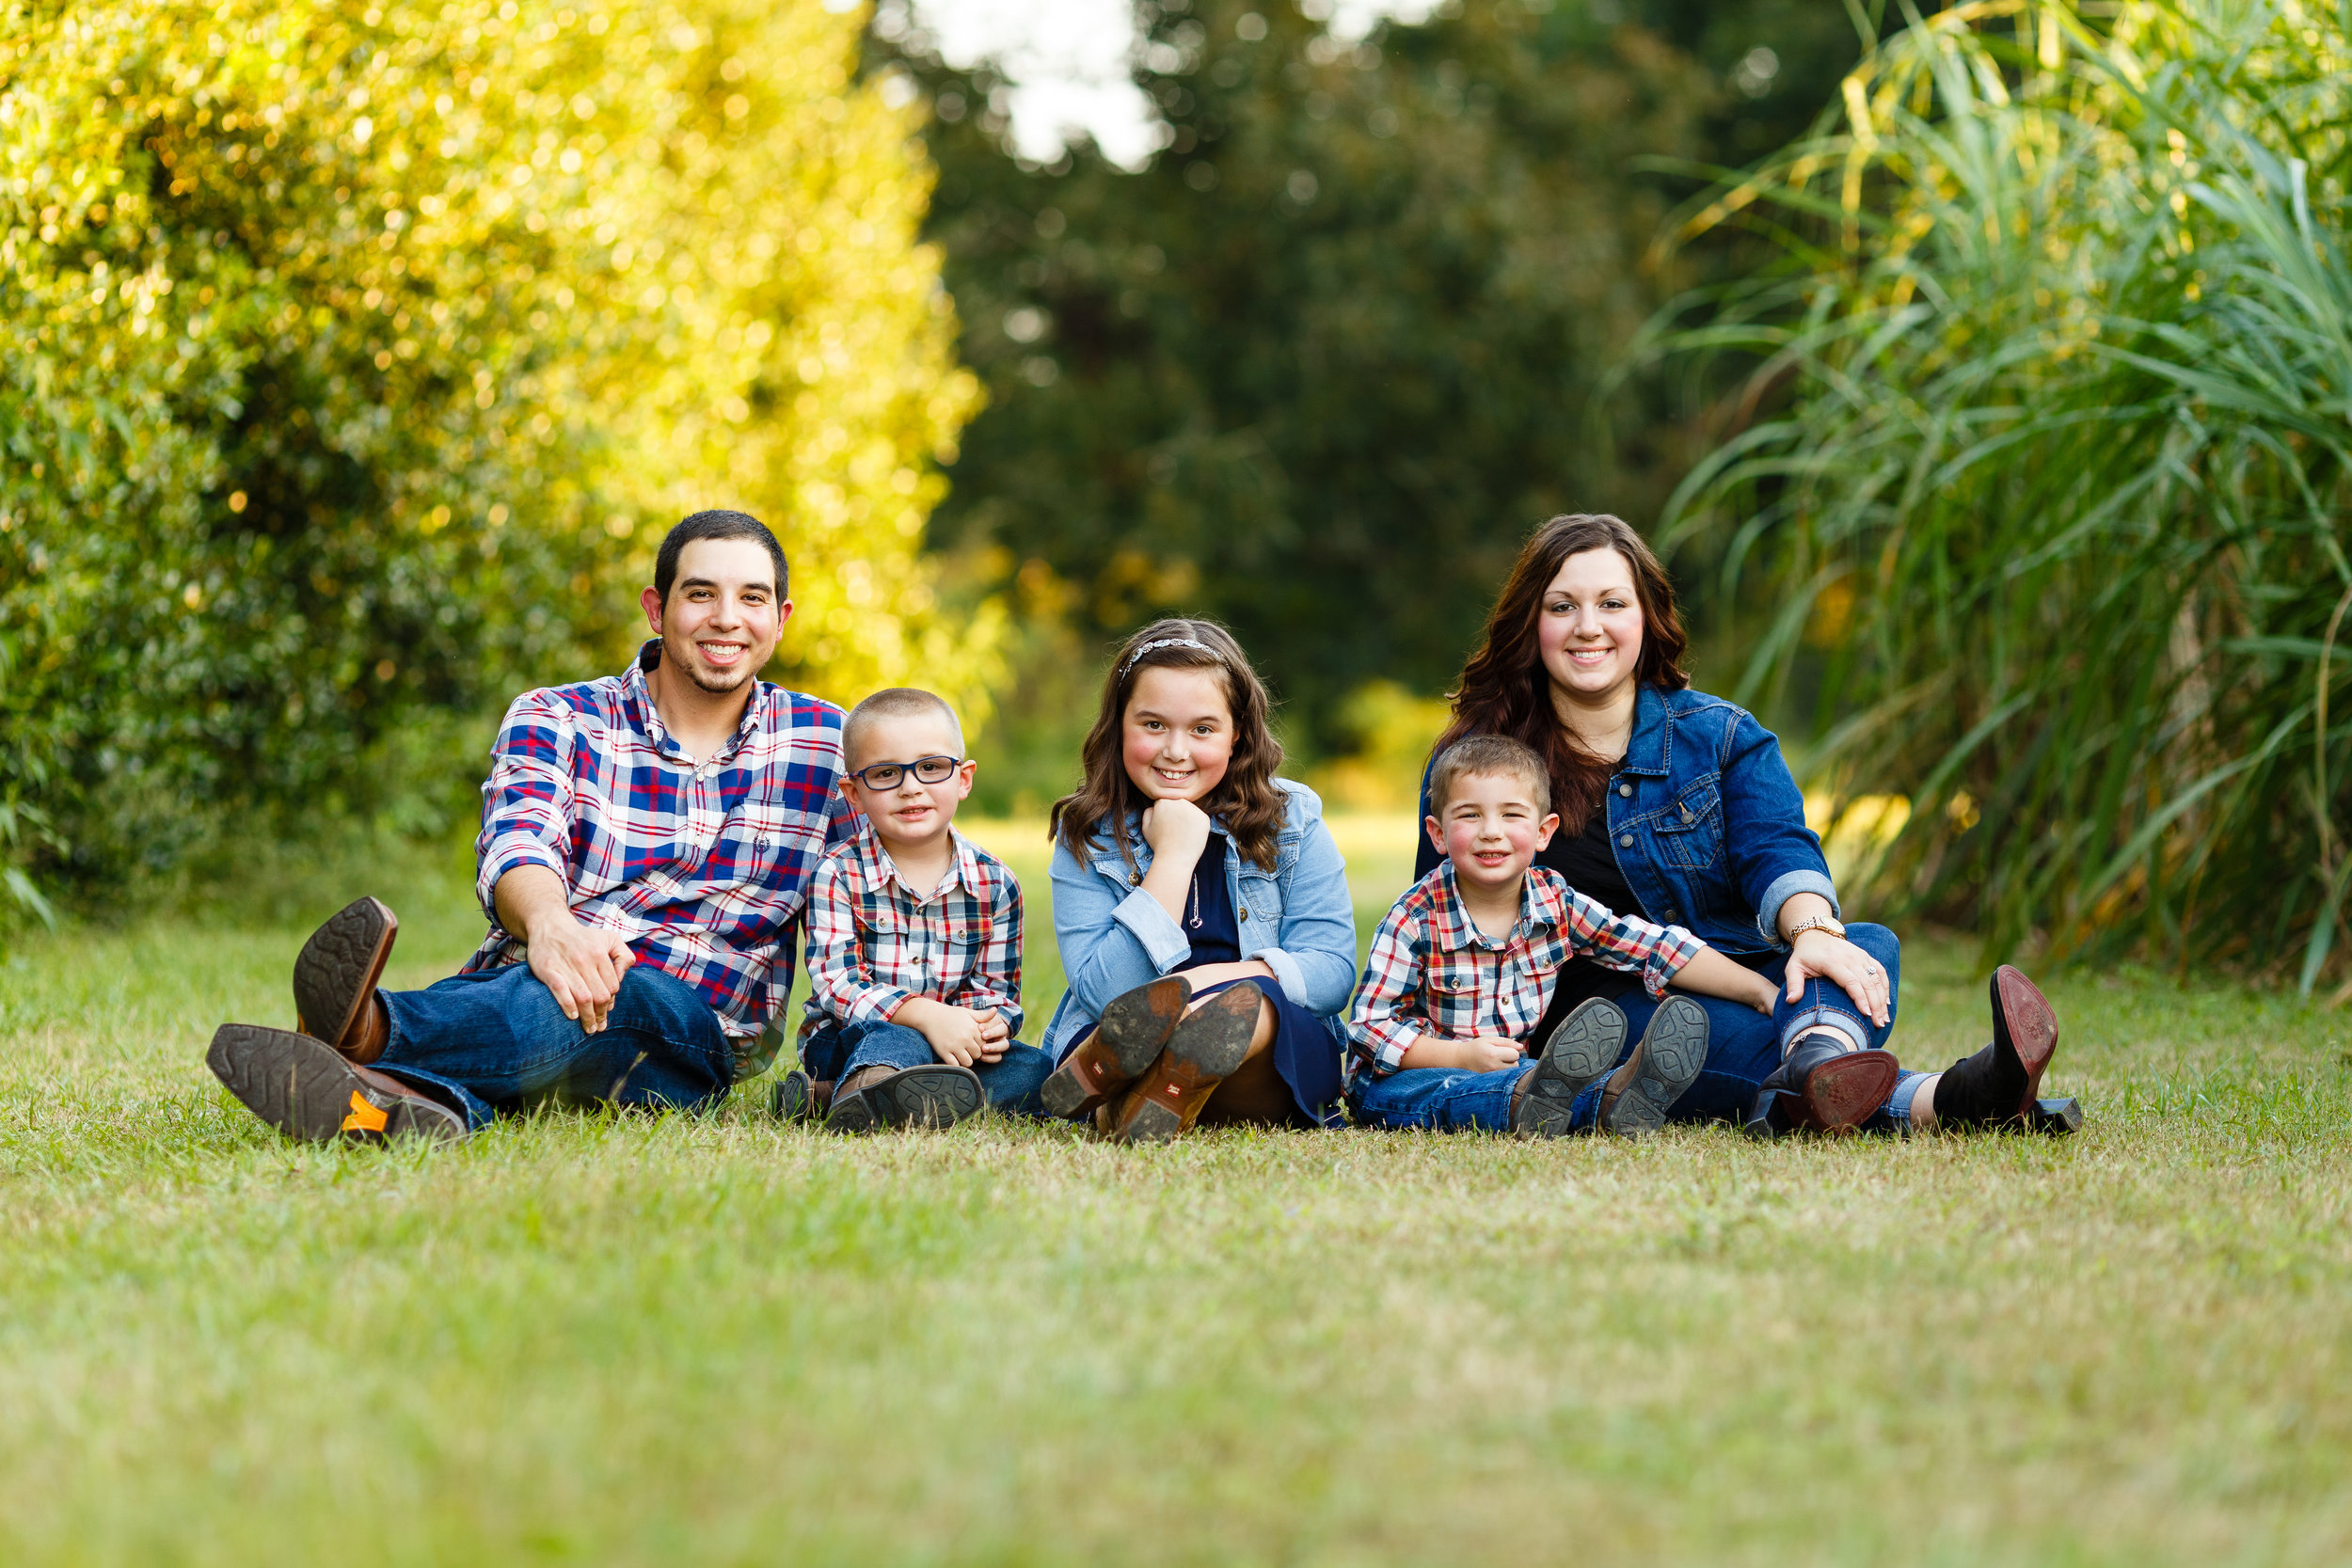 Family-child-portrait-lafayette-broussard-youngsville-photographer-31.jpg